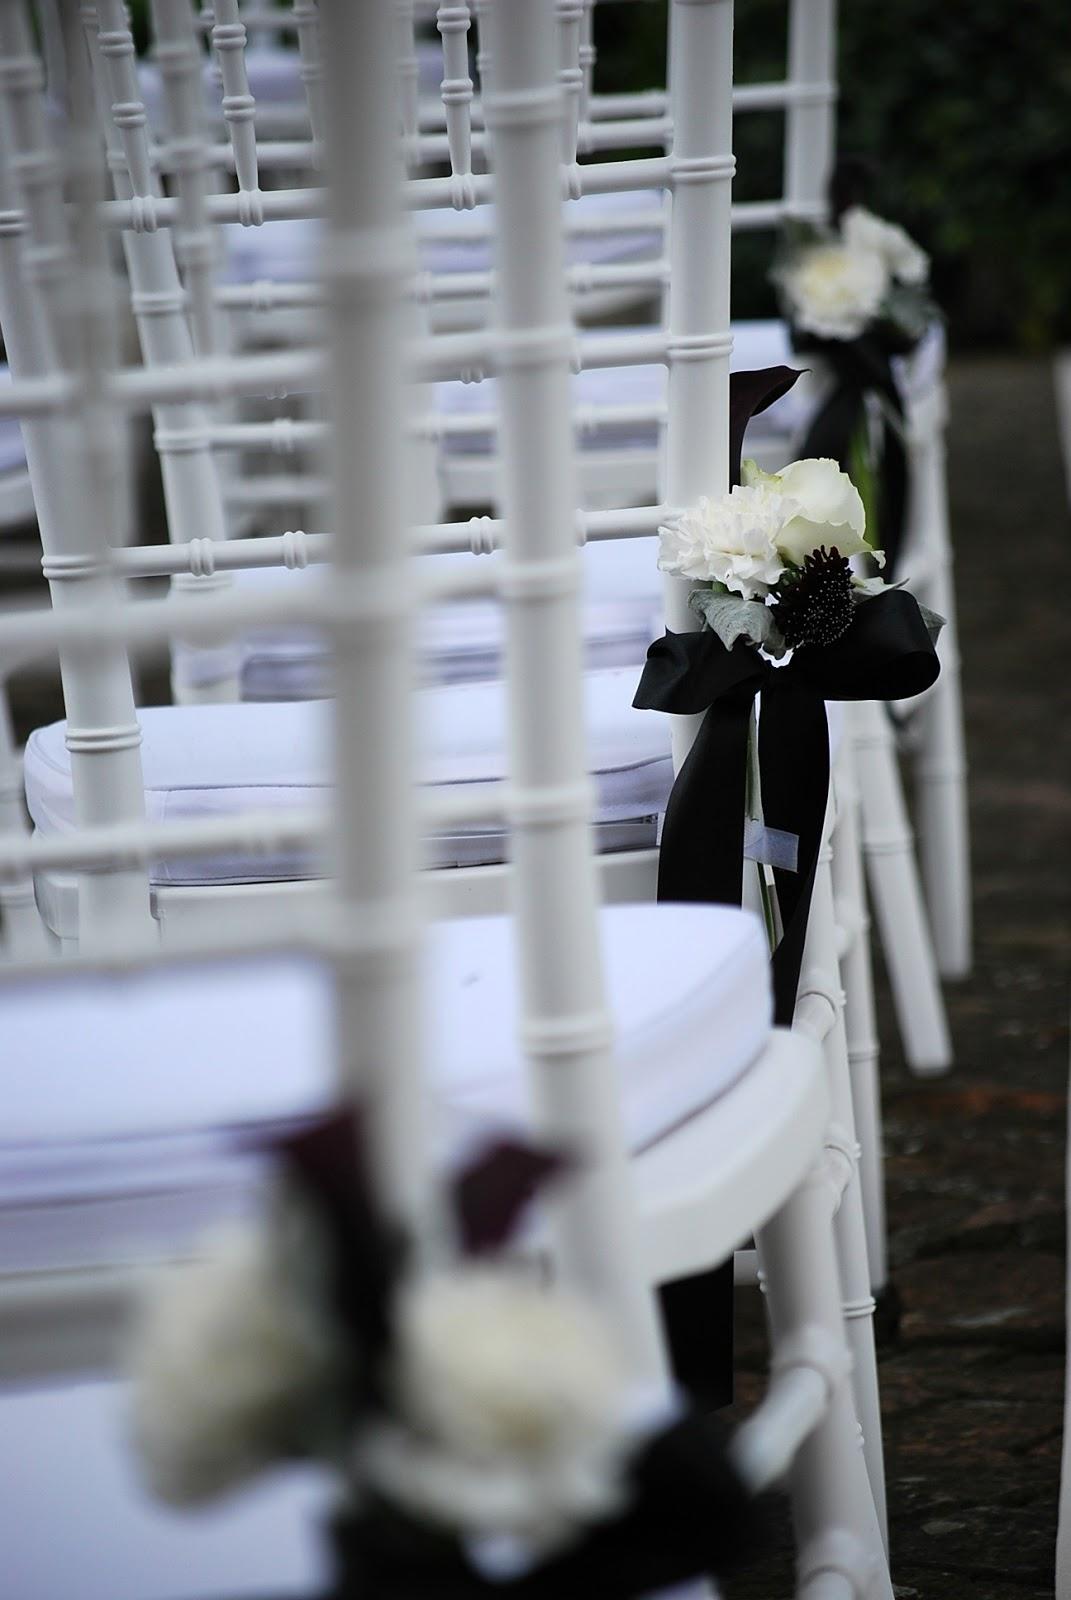 Matrimonio In Bianco E Nero : Fior déco arianna e daniele un matrimonio in bianco e nero